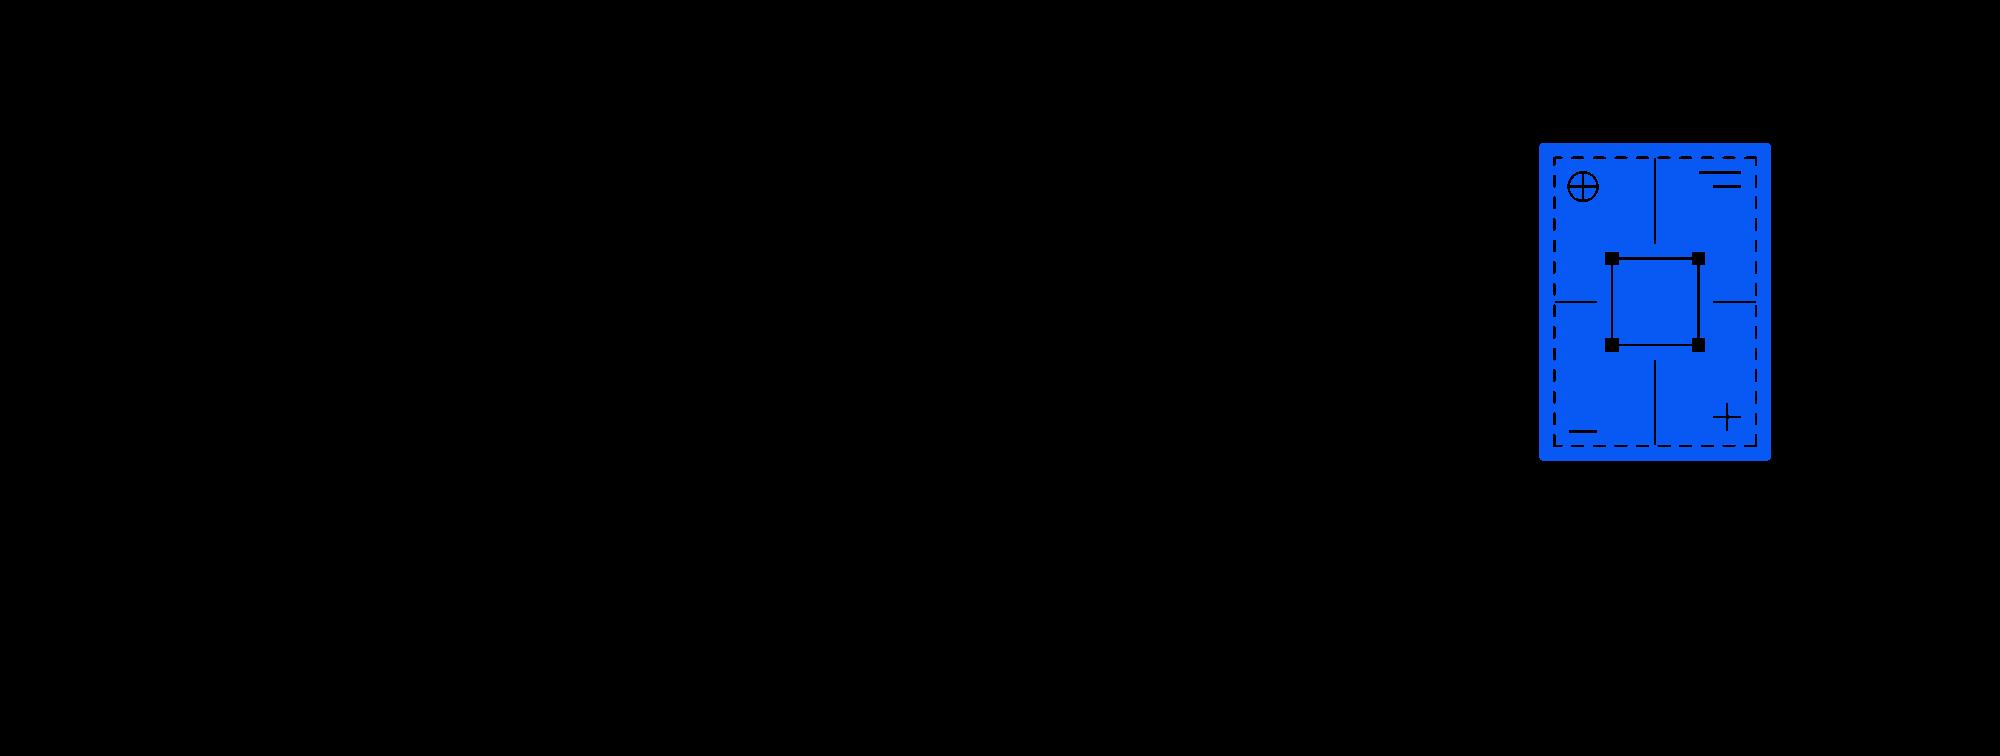 Dani Health WL Blueprint Logo.png